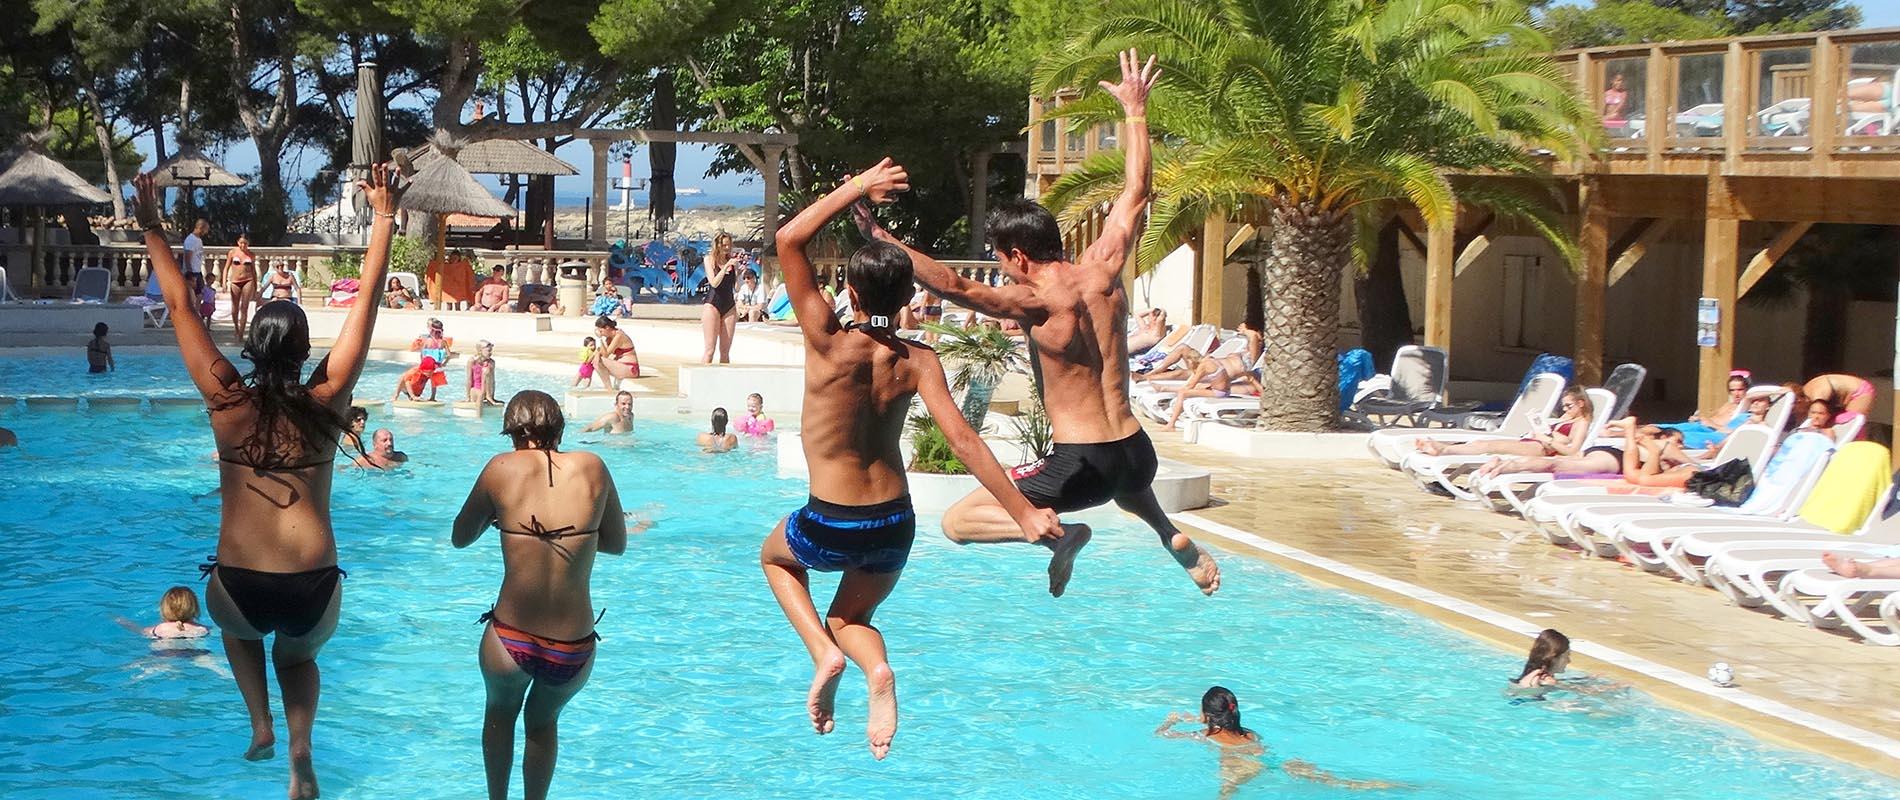 Beheiztes Schwimmbad<br>23°C Mini